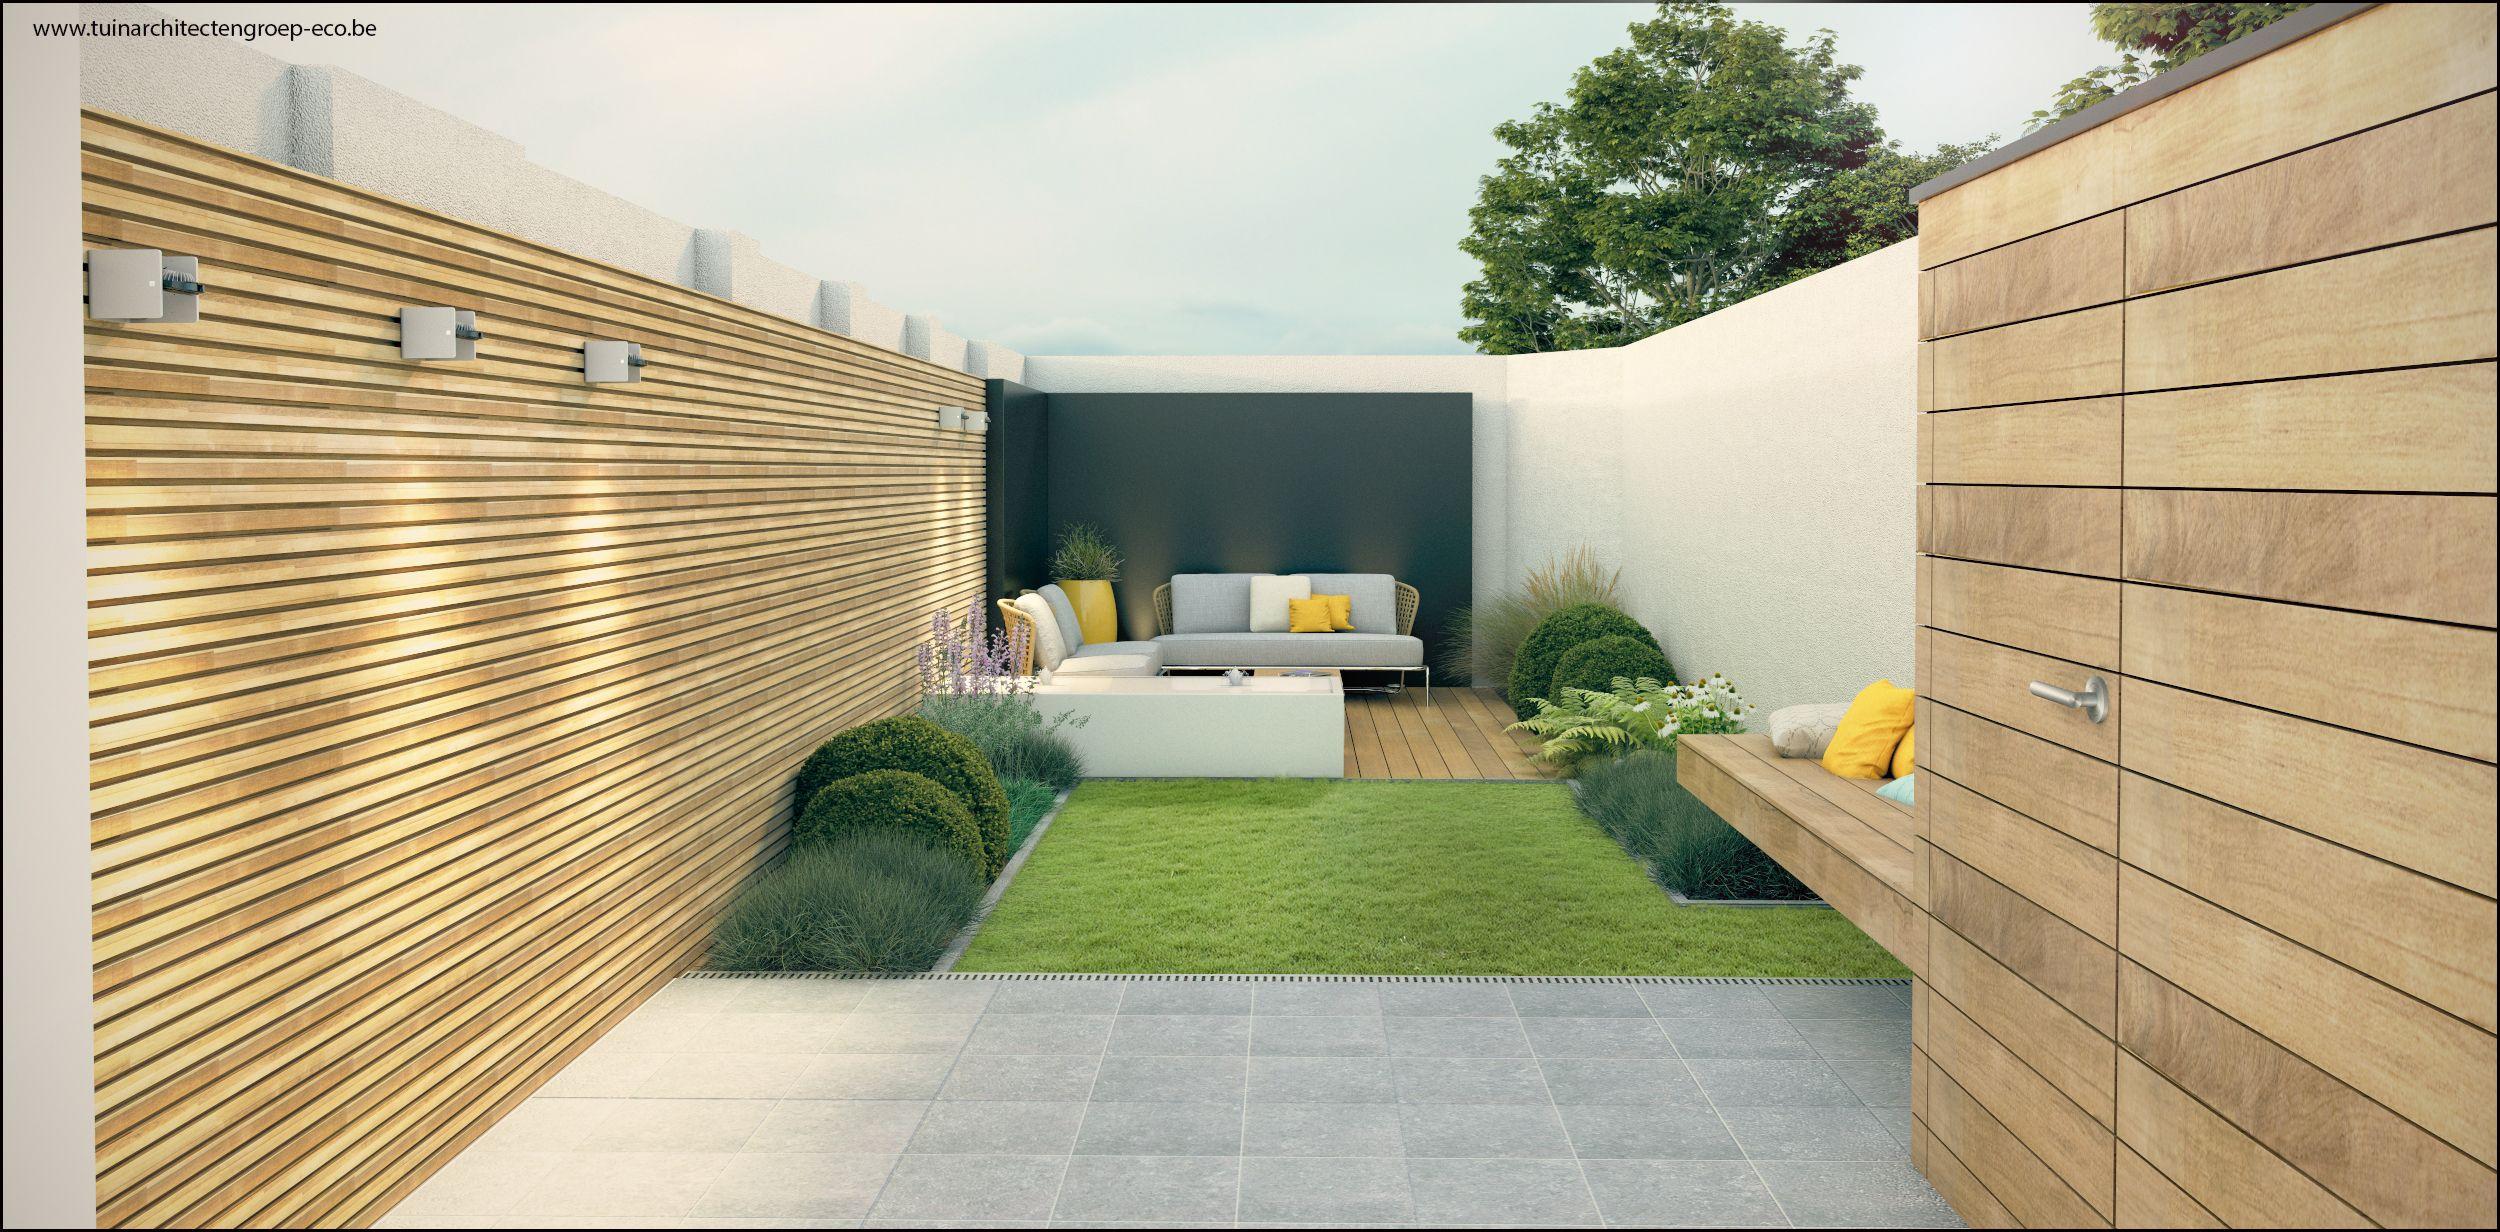 Tuinontwerp kleine stadstuin tuinarchitect timothy cools firma tuinarchitectengroep eco bvba - Lay outs deco tuin ...